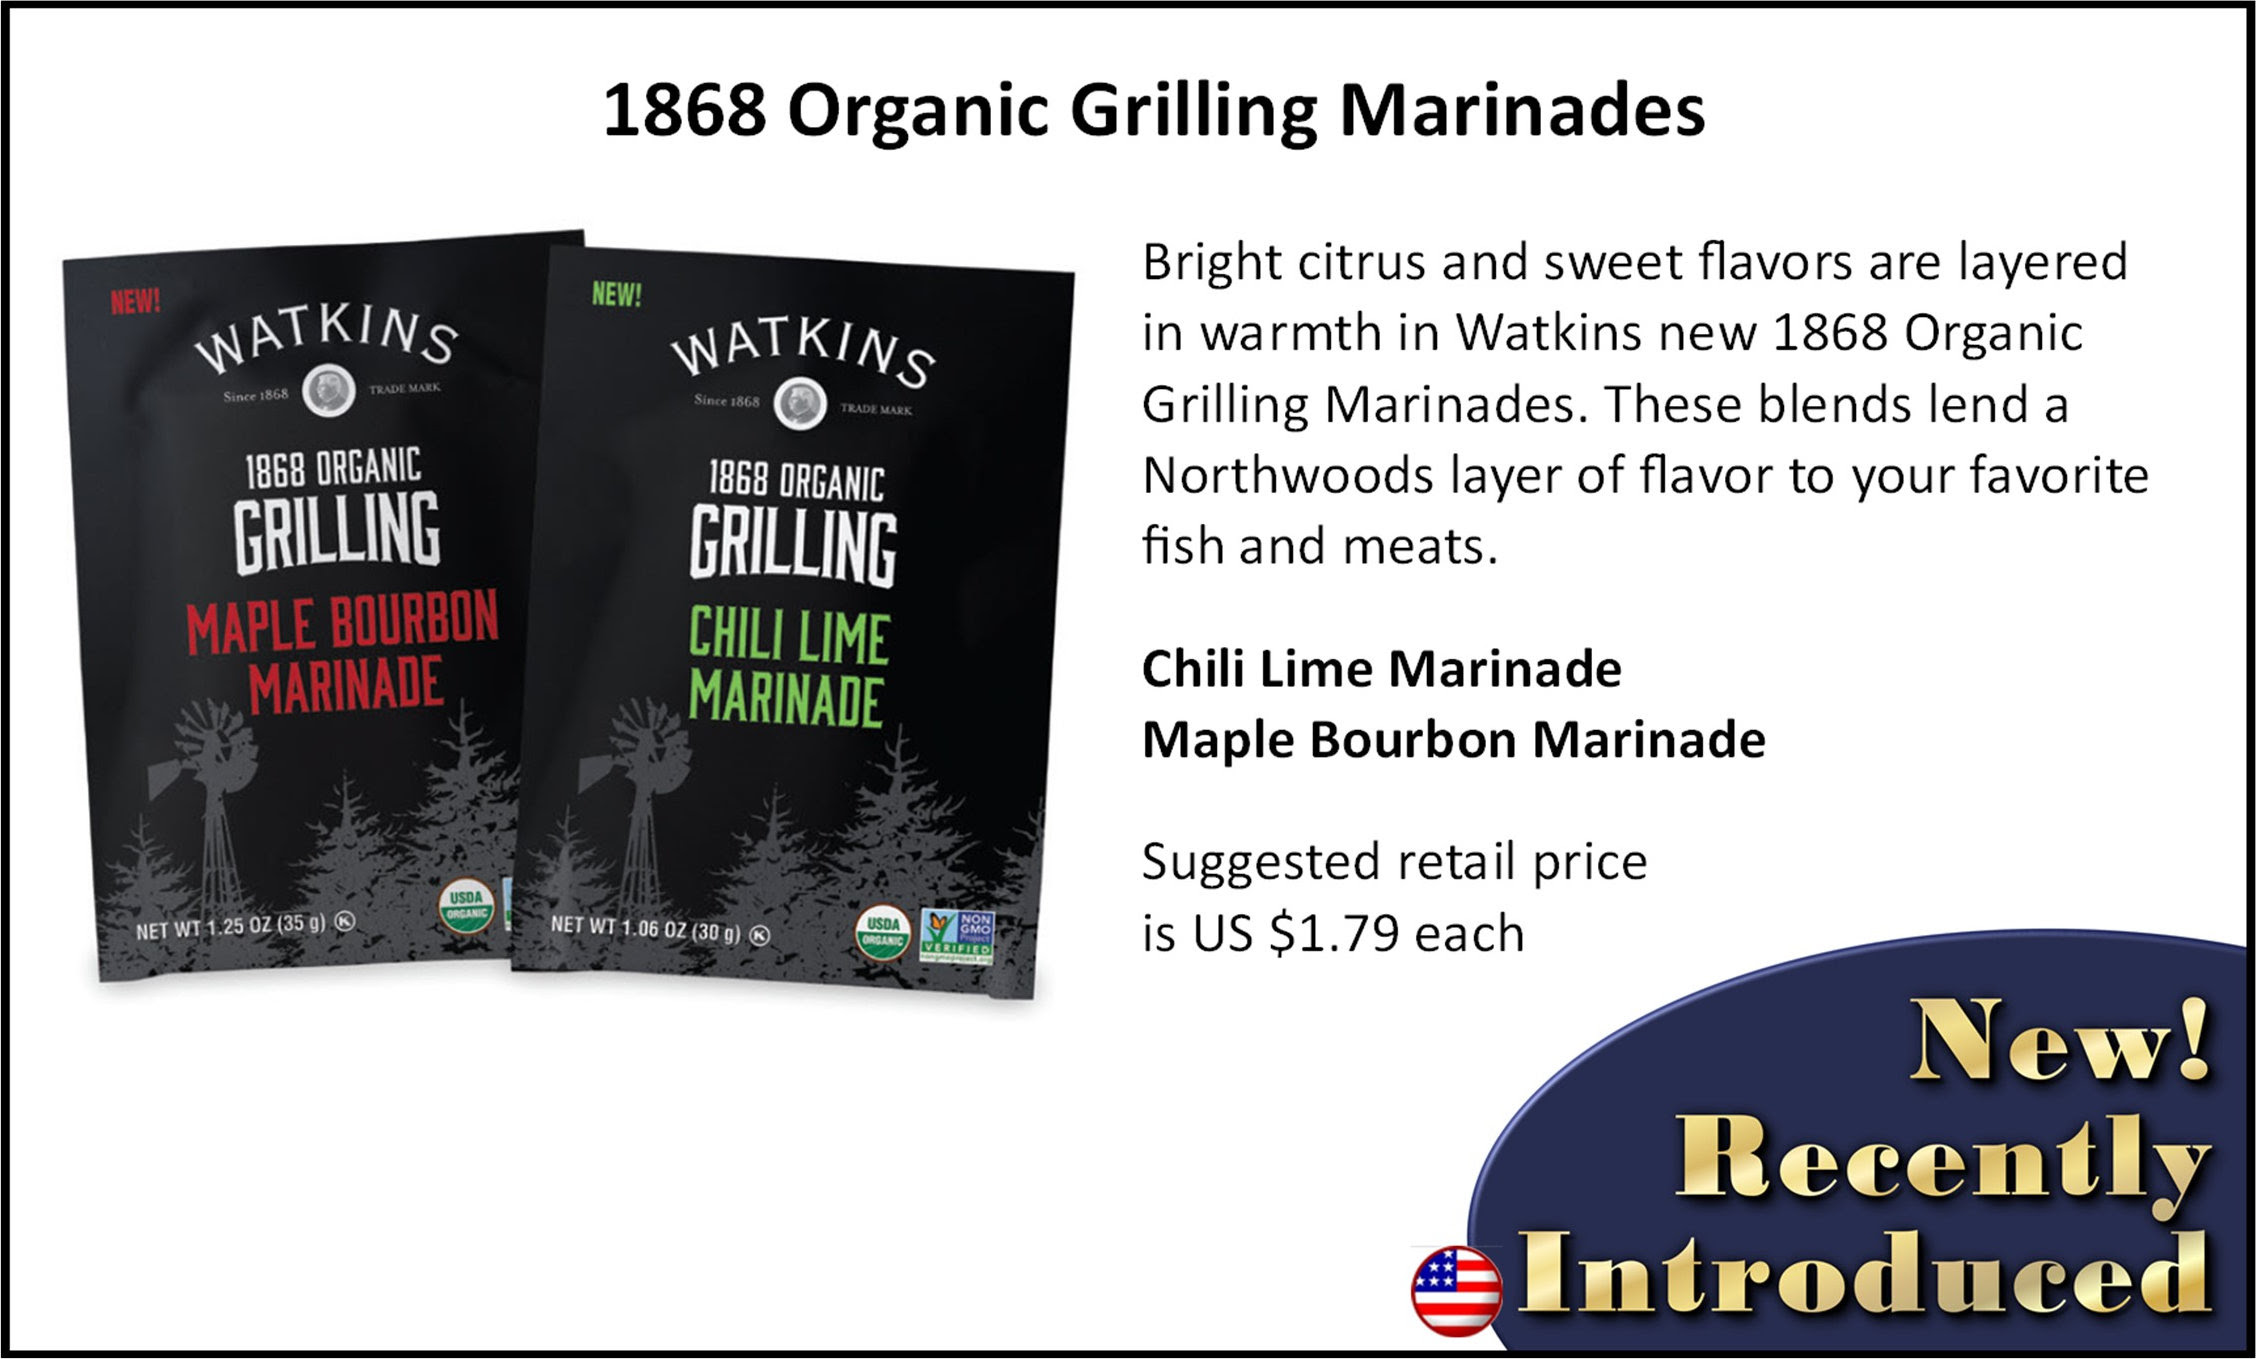 Watkins Grilling Marinades